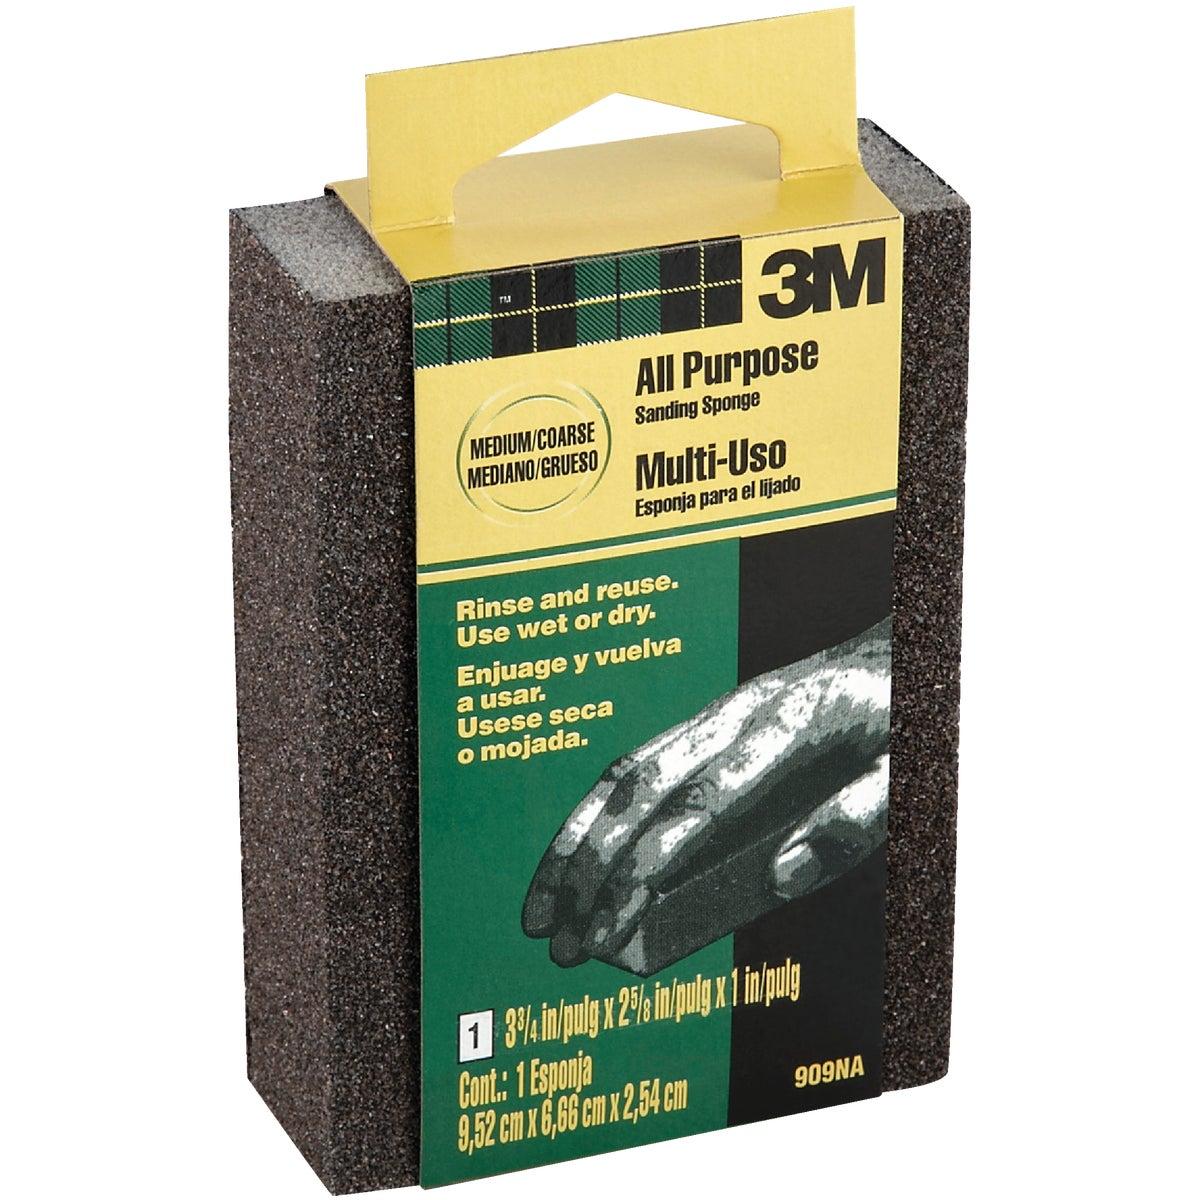 3M All-Purpose 2-5/8 In. x 3-3/4 In. x 1 In. Medium/Coarse Sanding Sponge